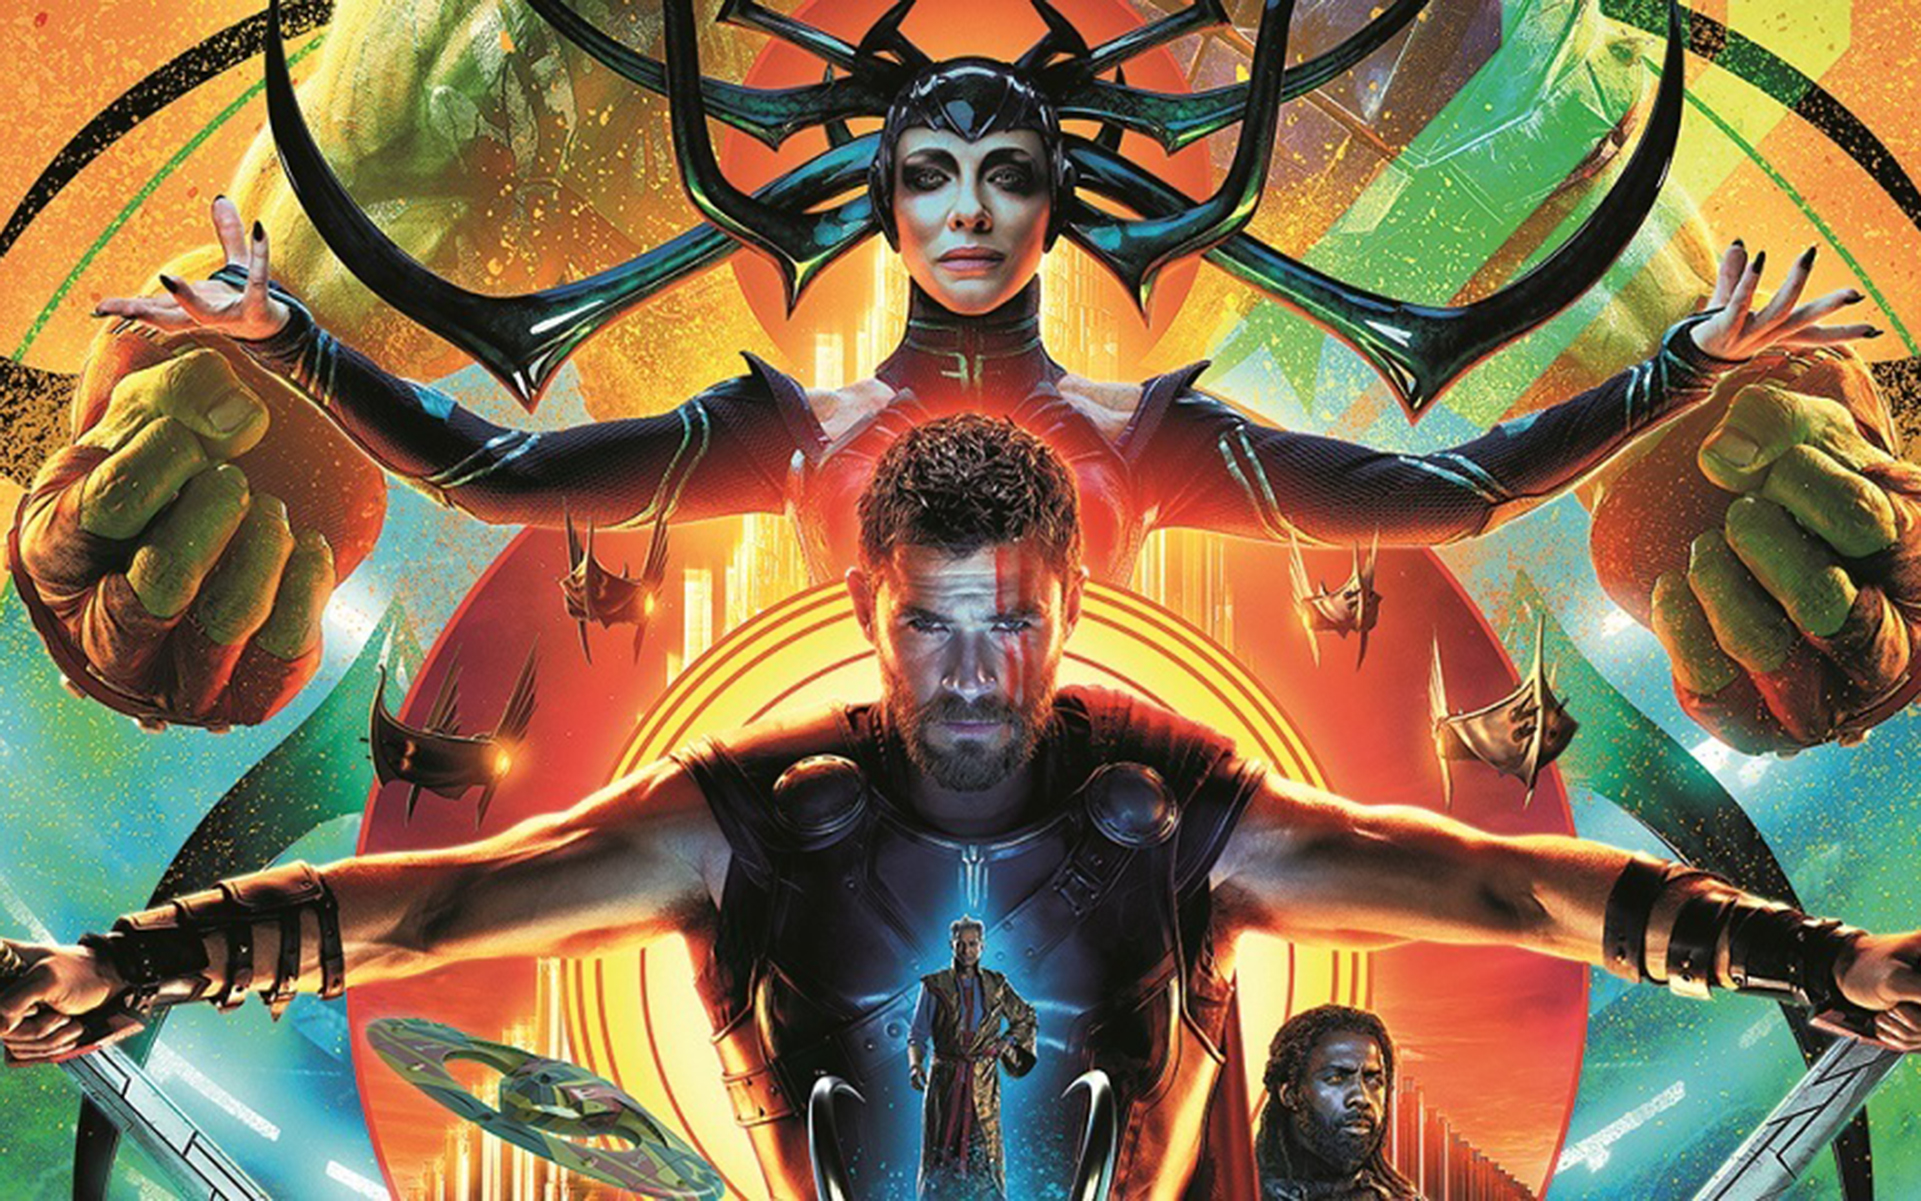 'Thor: Ragnarok': Is It Worth the High?